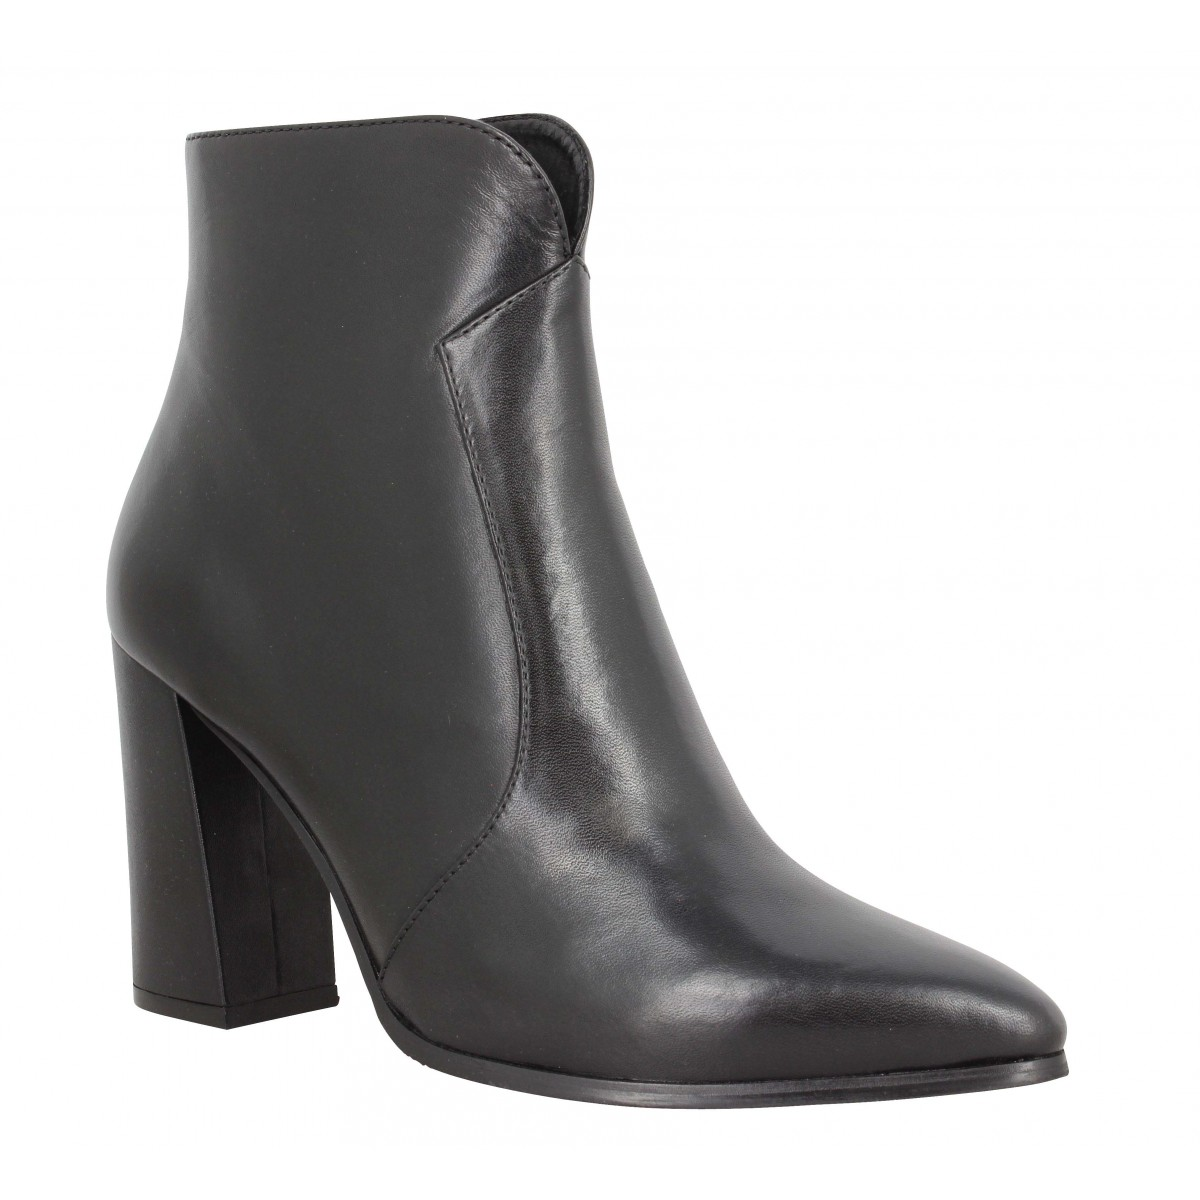 Bottines ADELE DEZOTTI 3602 cuir Femme Noir